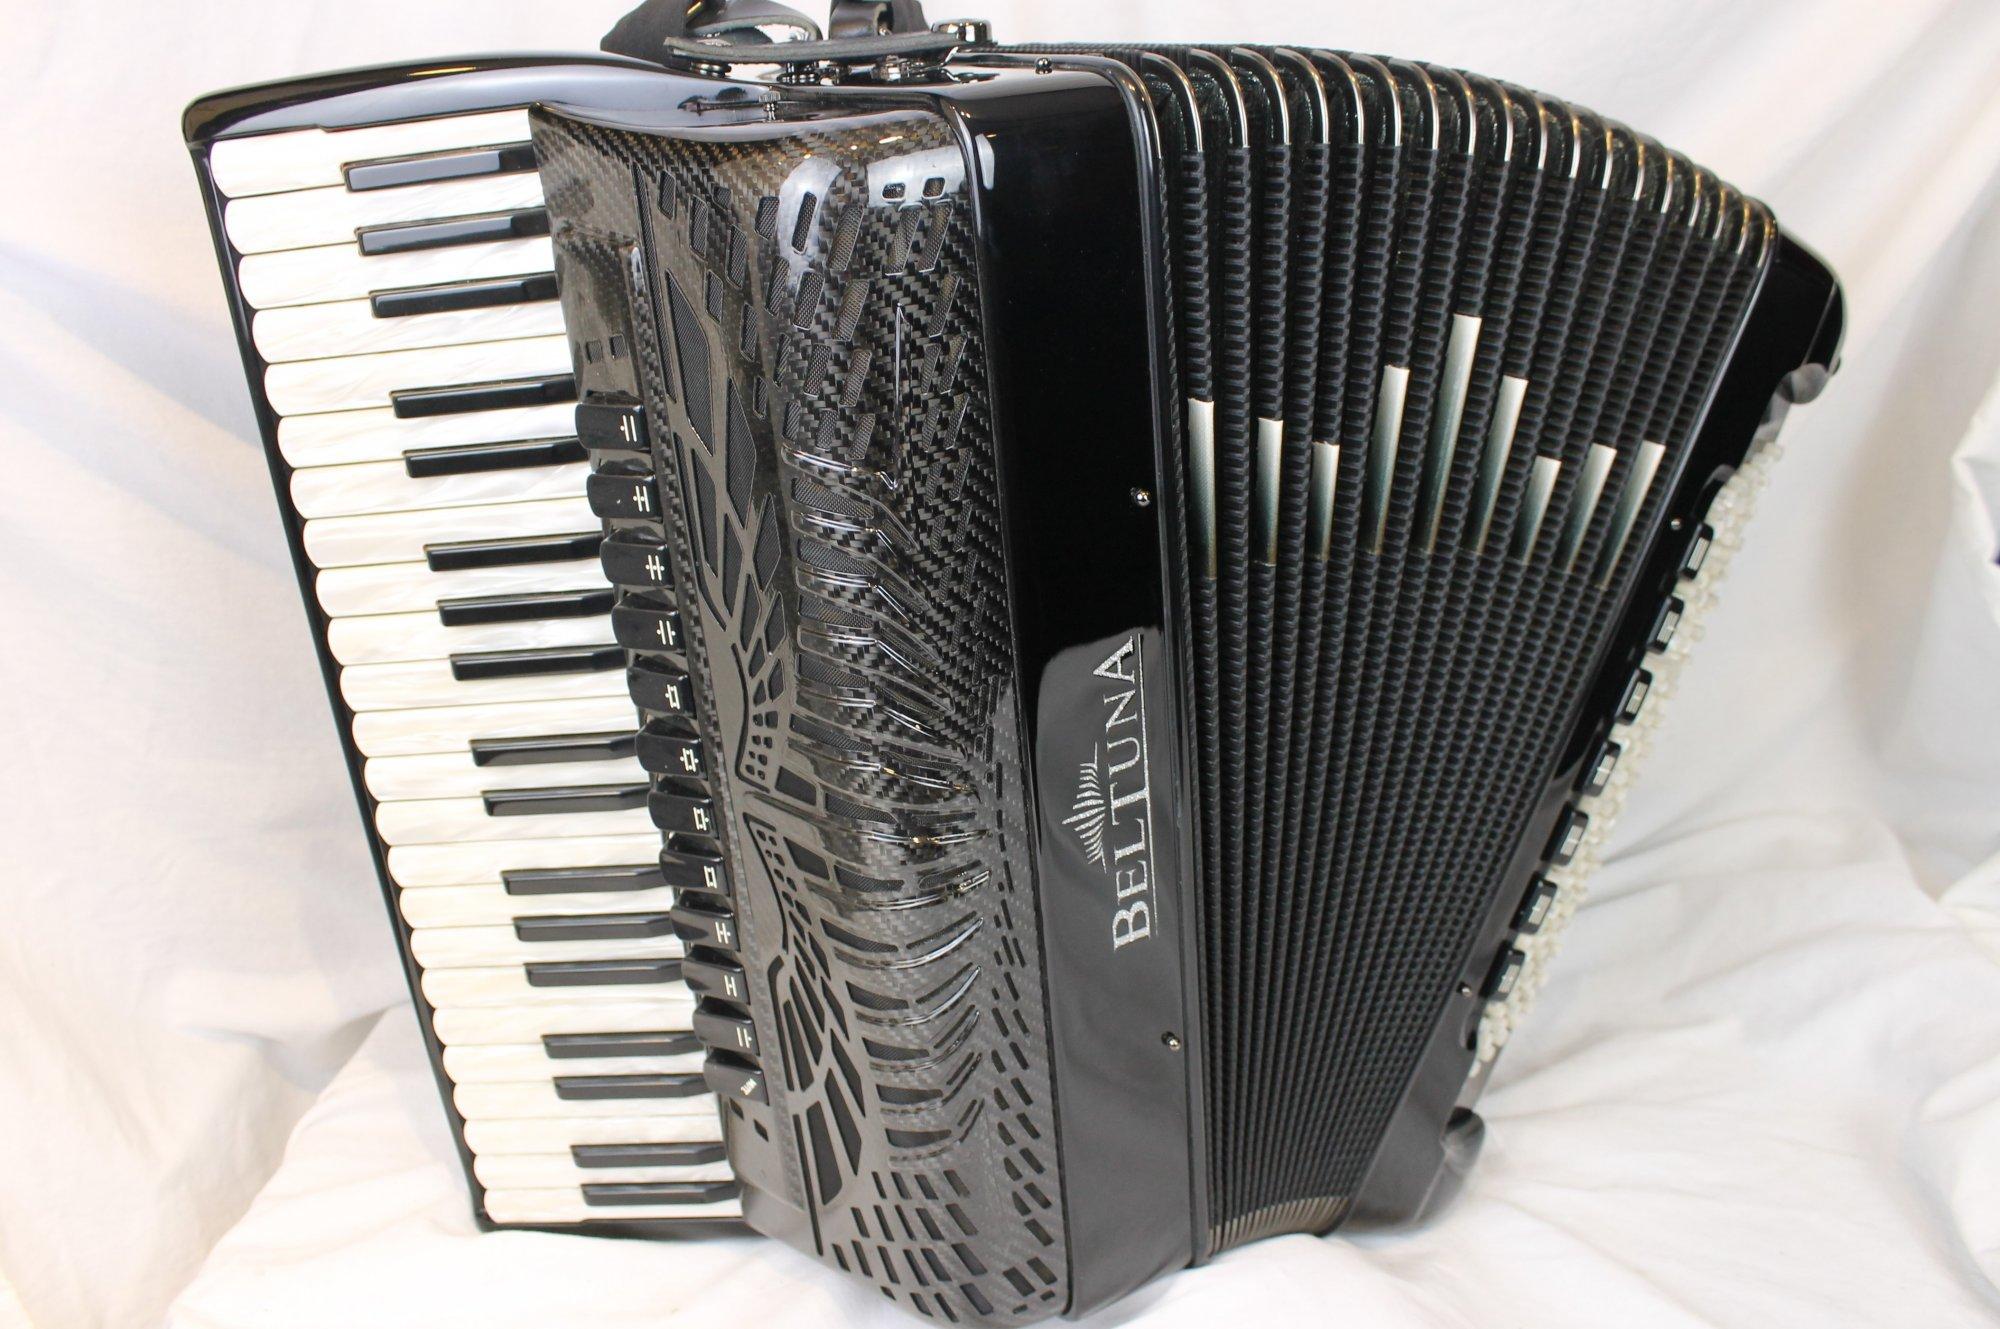 NEW Black Beltuna Prestige IV Fly Piano Accordion LMMH 41 120